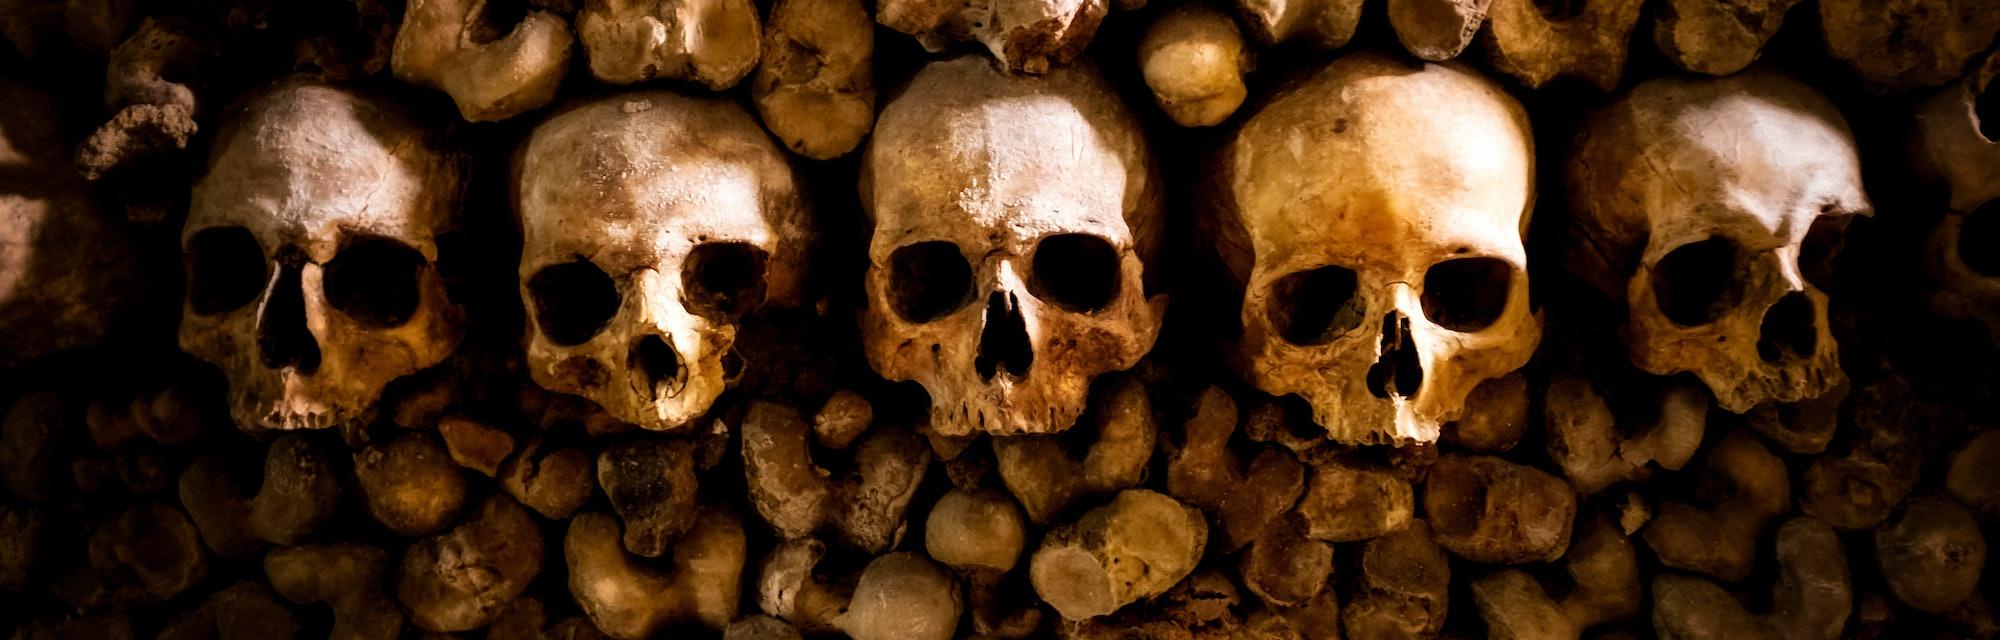 skulls and bones in Paris Catacombs France